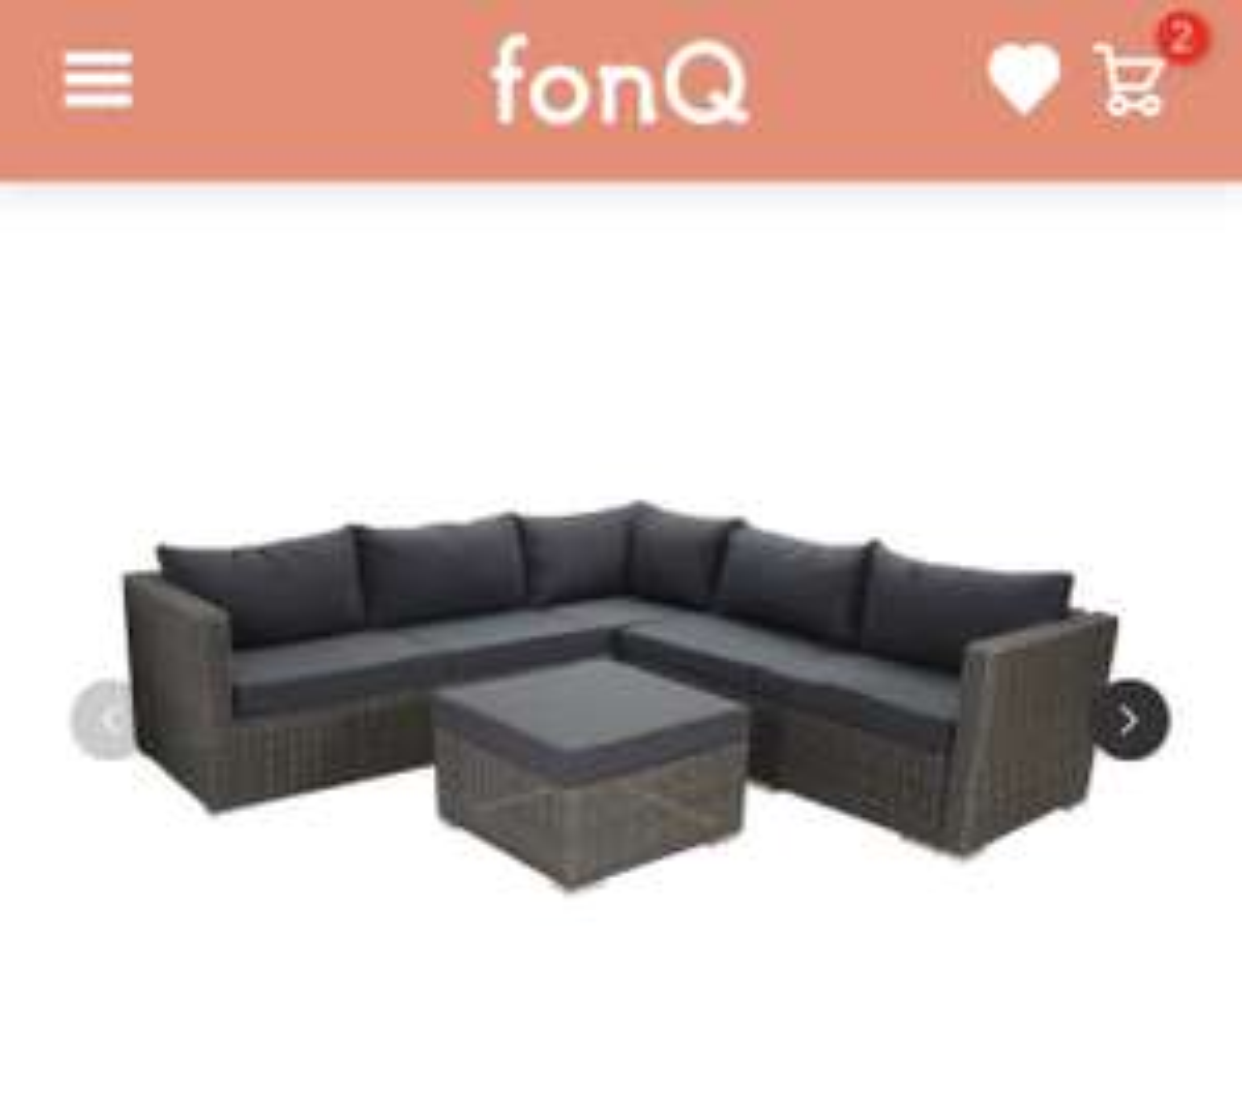 SenS-Line Granada Loungeset (-50%)  @Fonq.nl